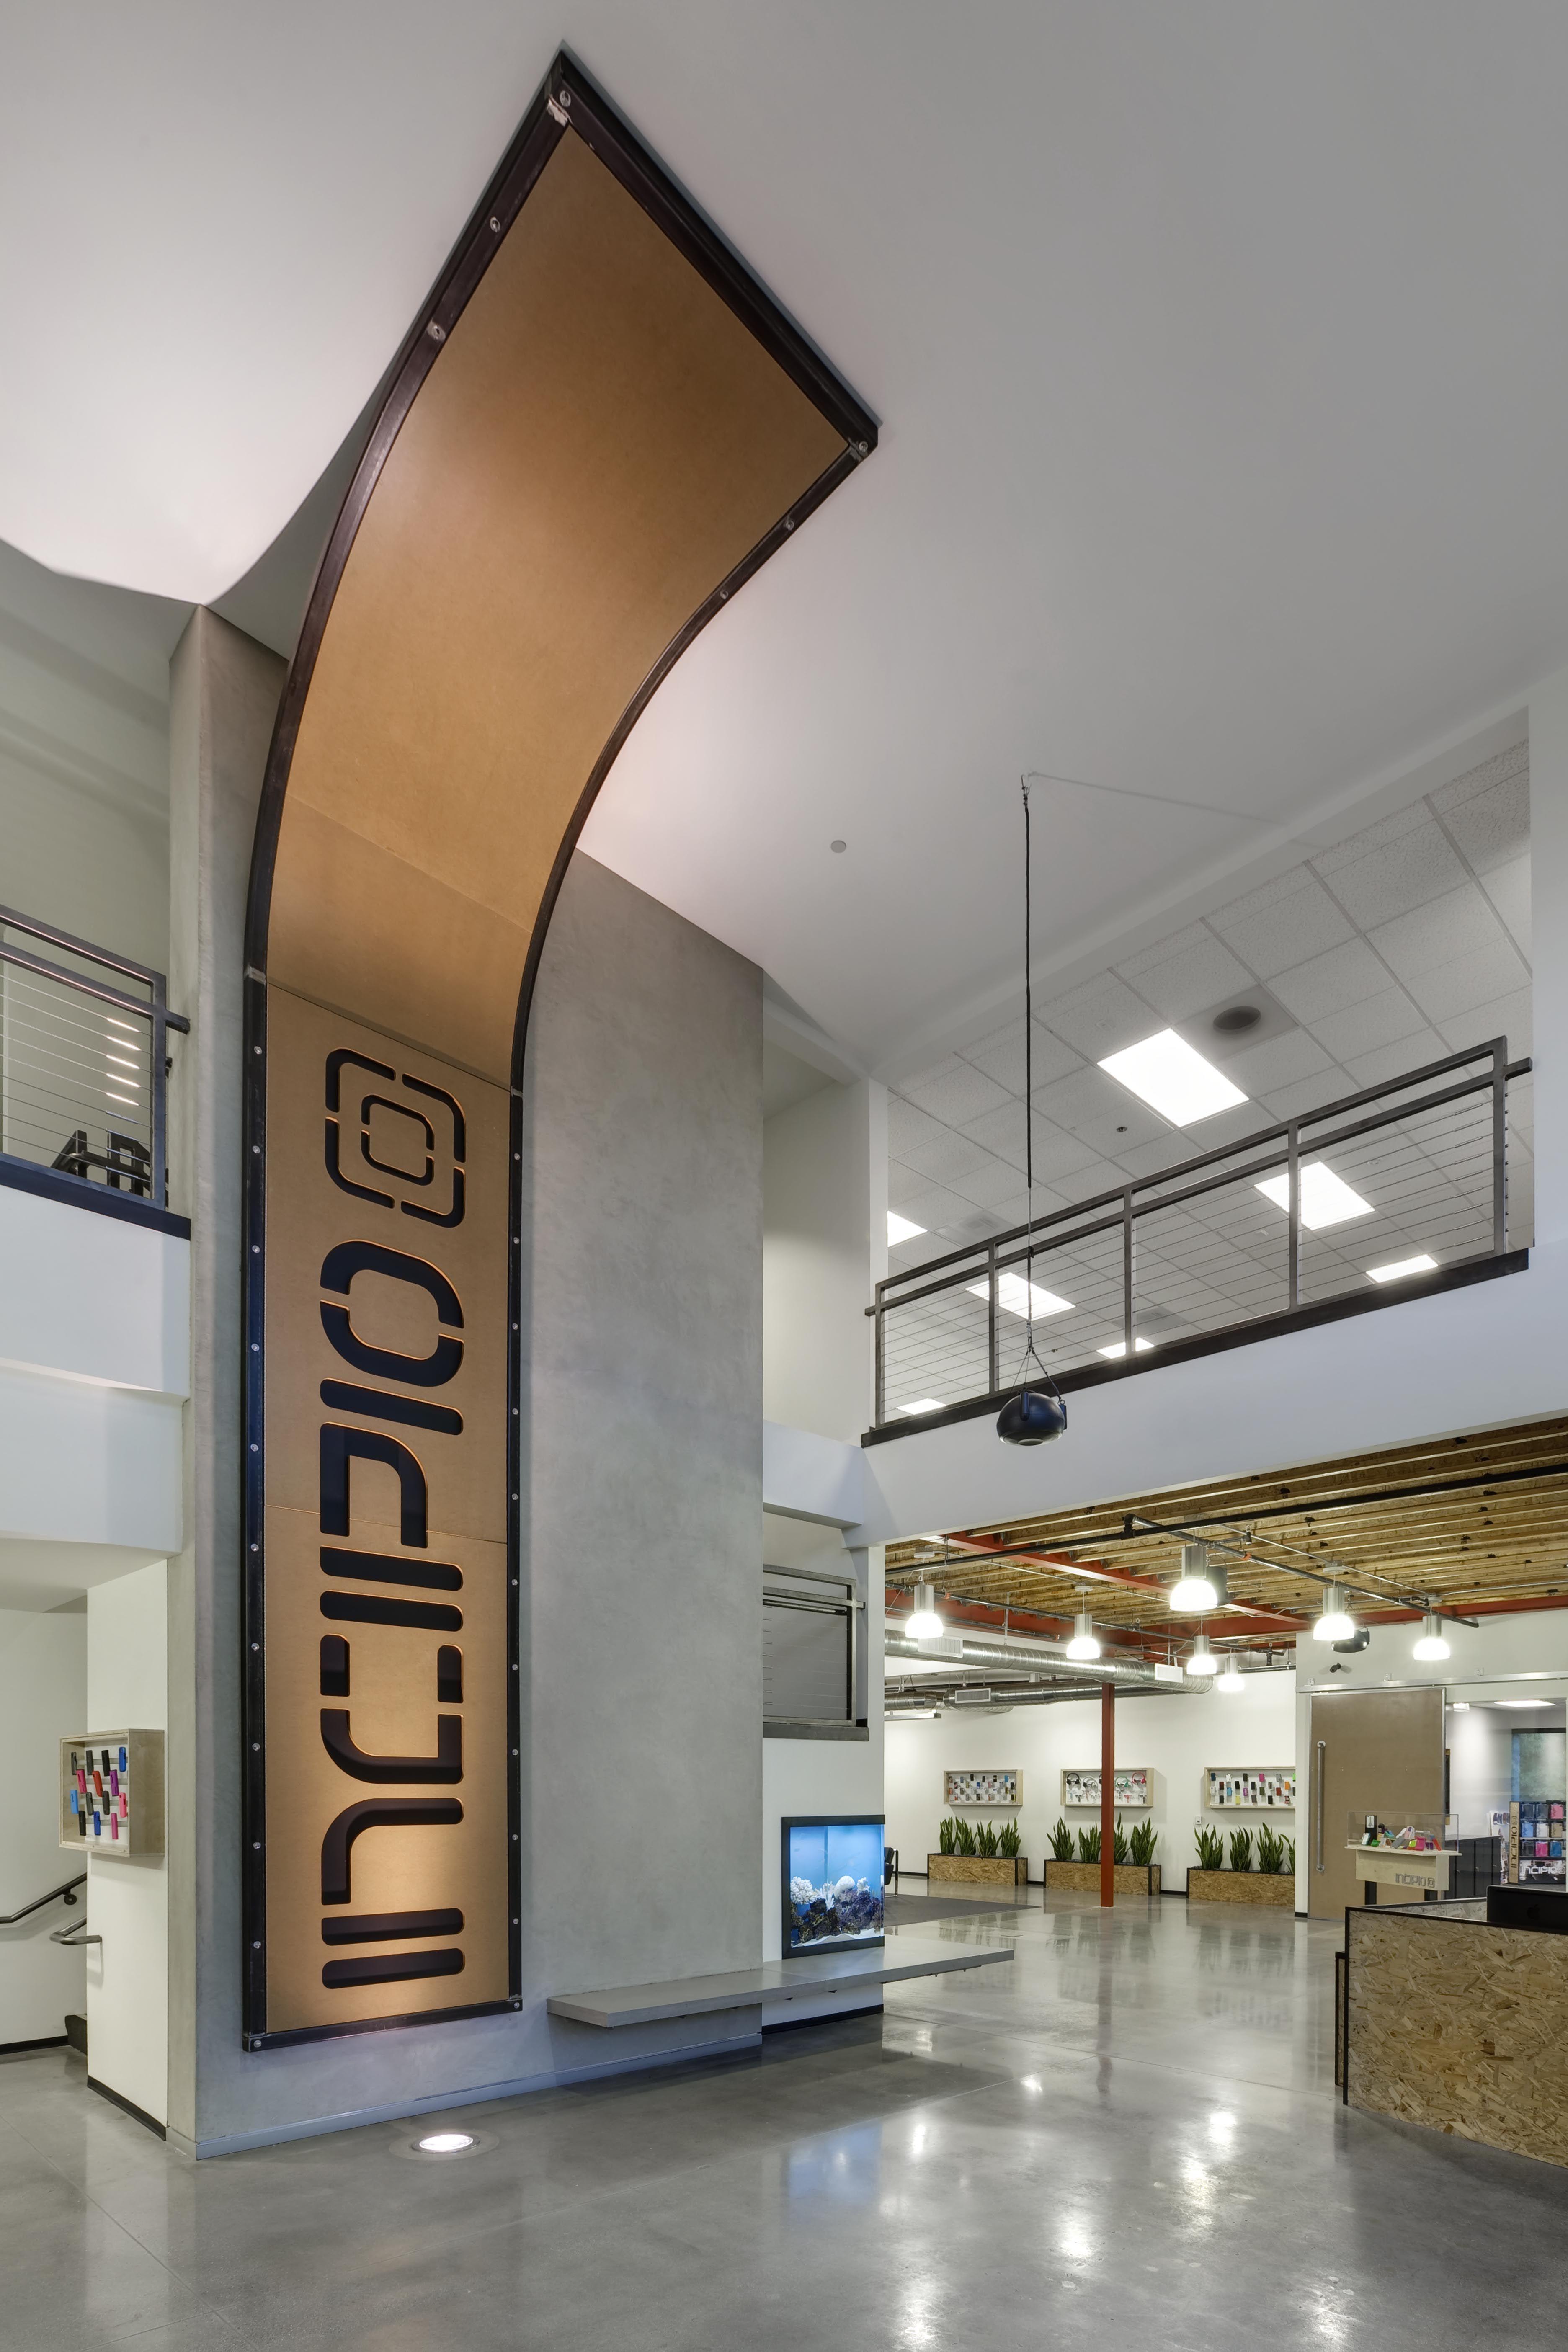 Incipio Corporate Headquarters Lobby Branded